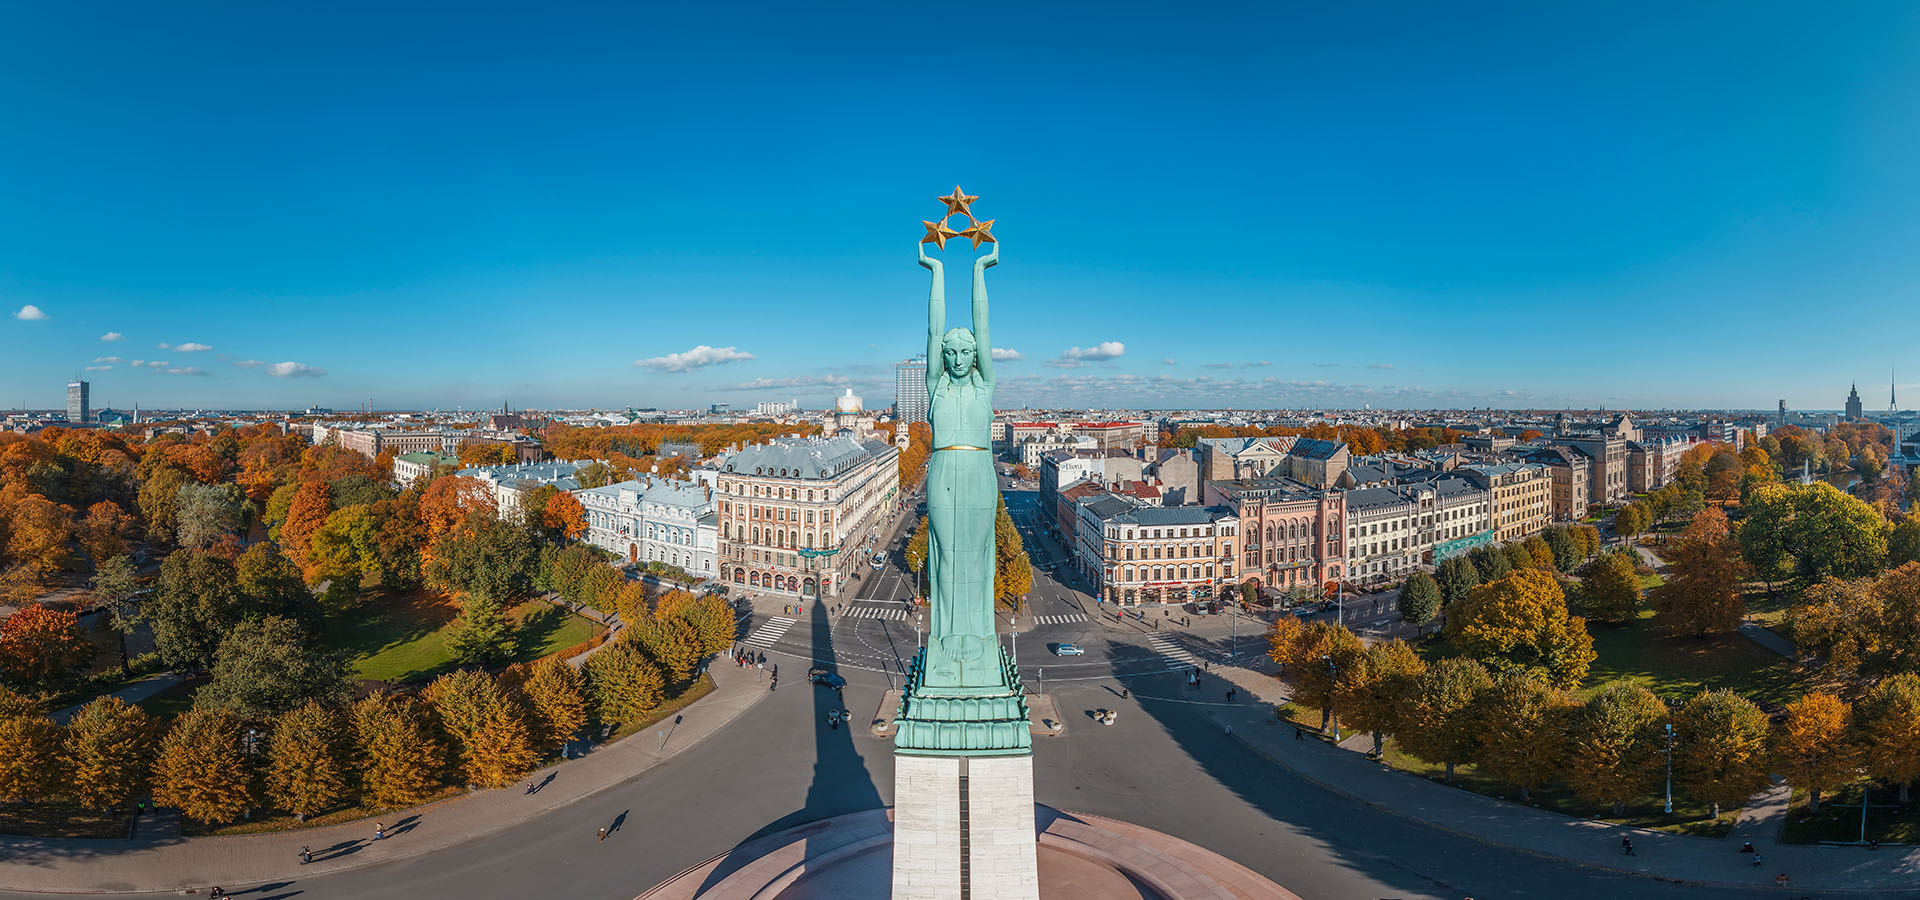 Brivibas-piemineklis-Old_Riga_Latvia_aerial_360_degree_panorama_OCEAN.LV_